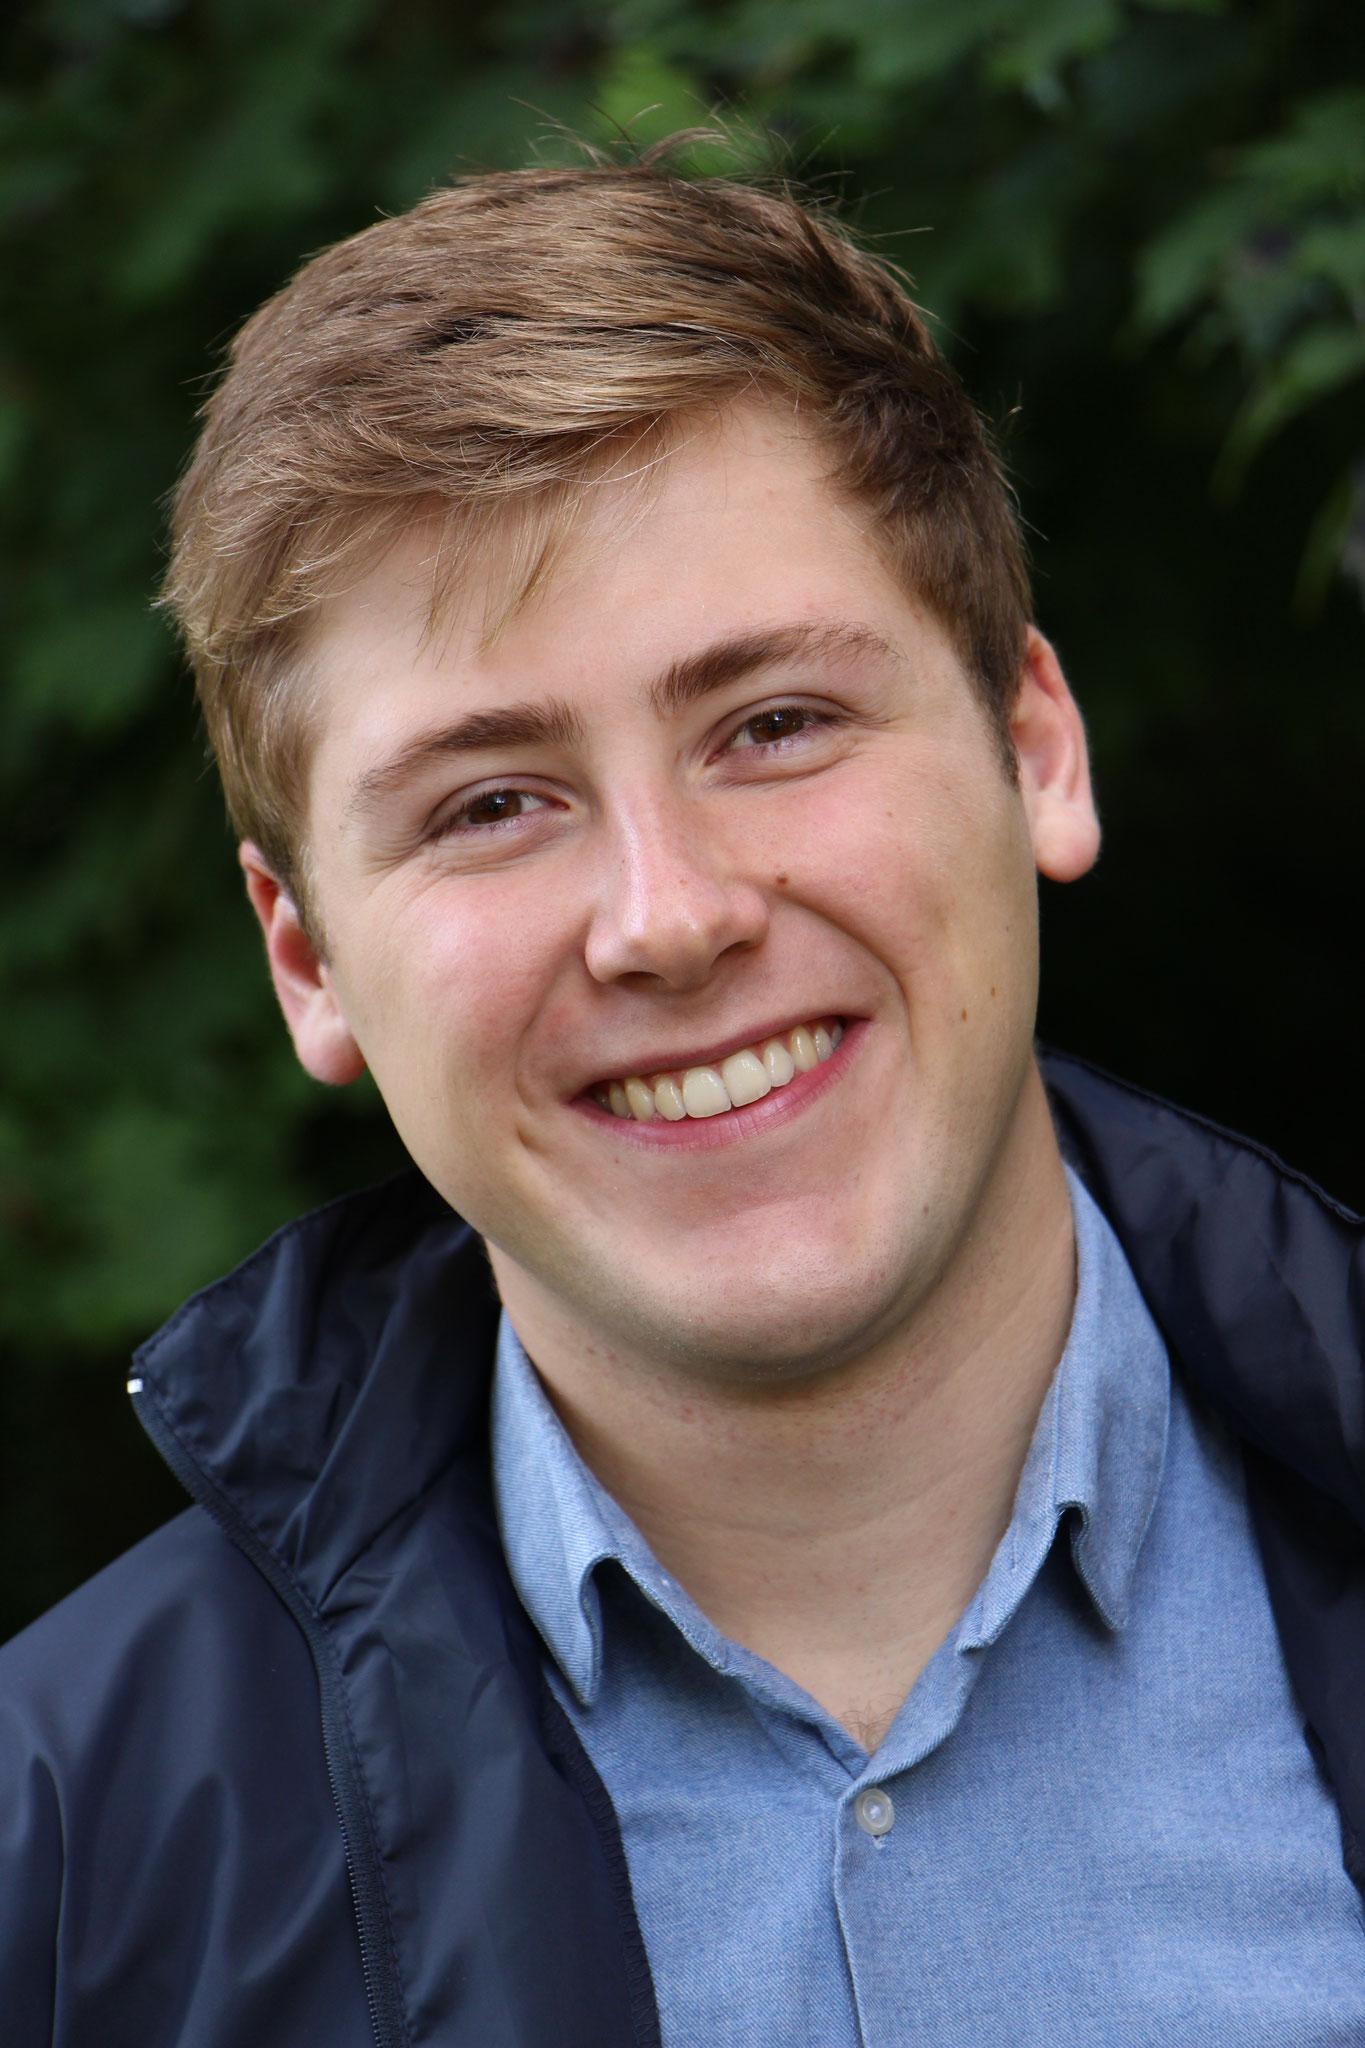 Jean-Baptiste Dufour, 21 ans, Beauséjour